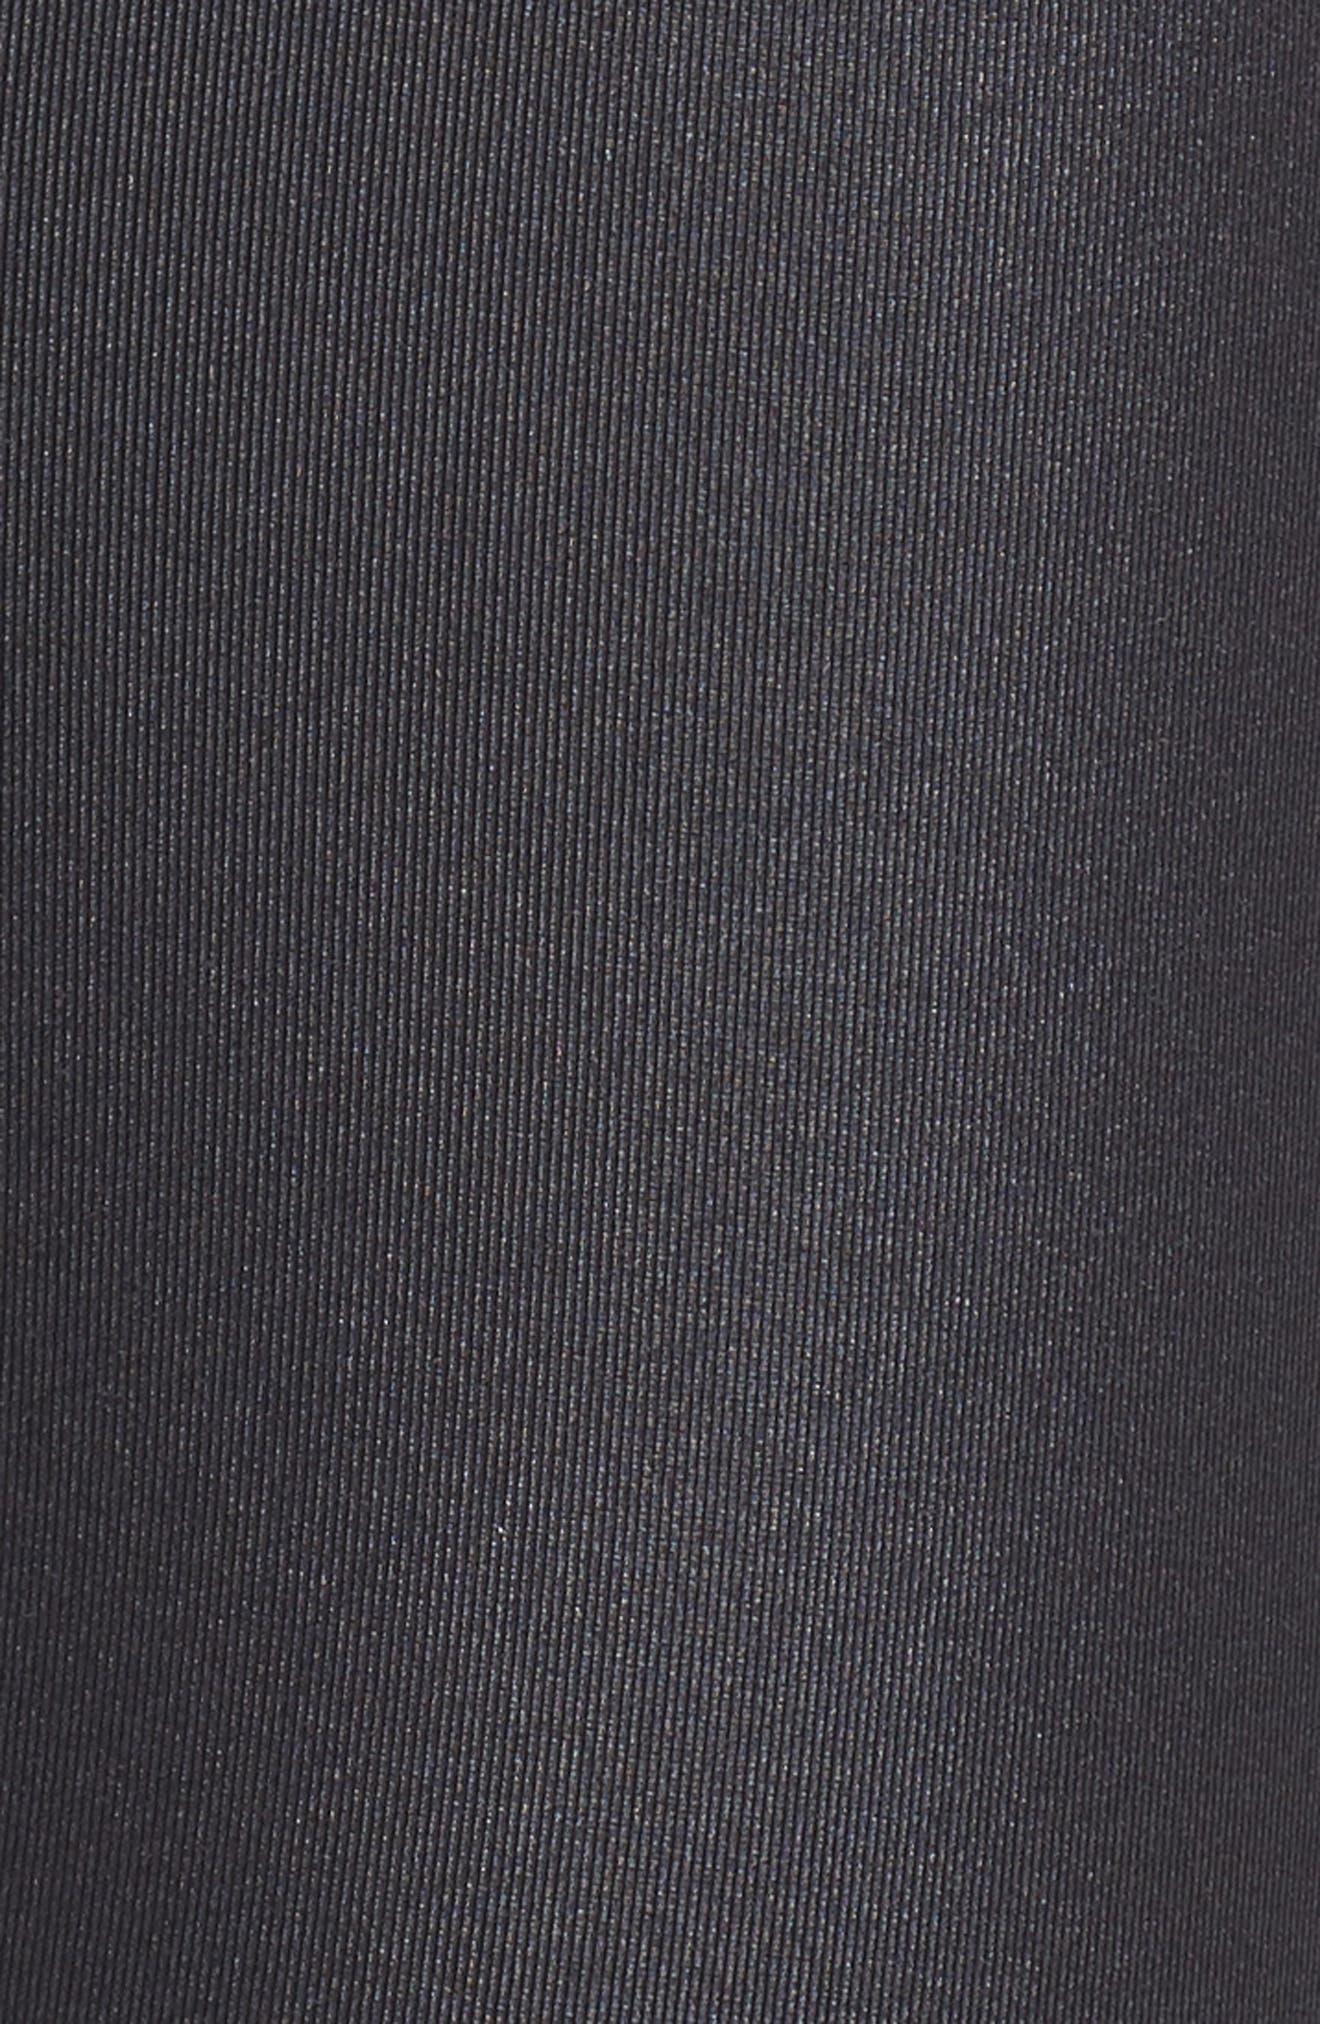 High Waist Airbrush Midi Leggings,                             Alternate thumbnail 6, color,                             BLACK GLOSSY